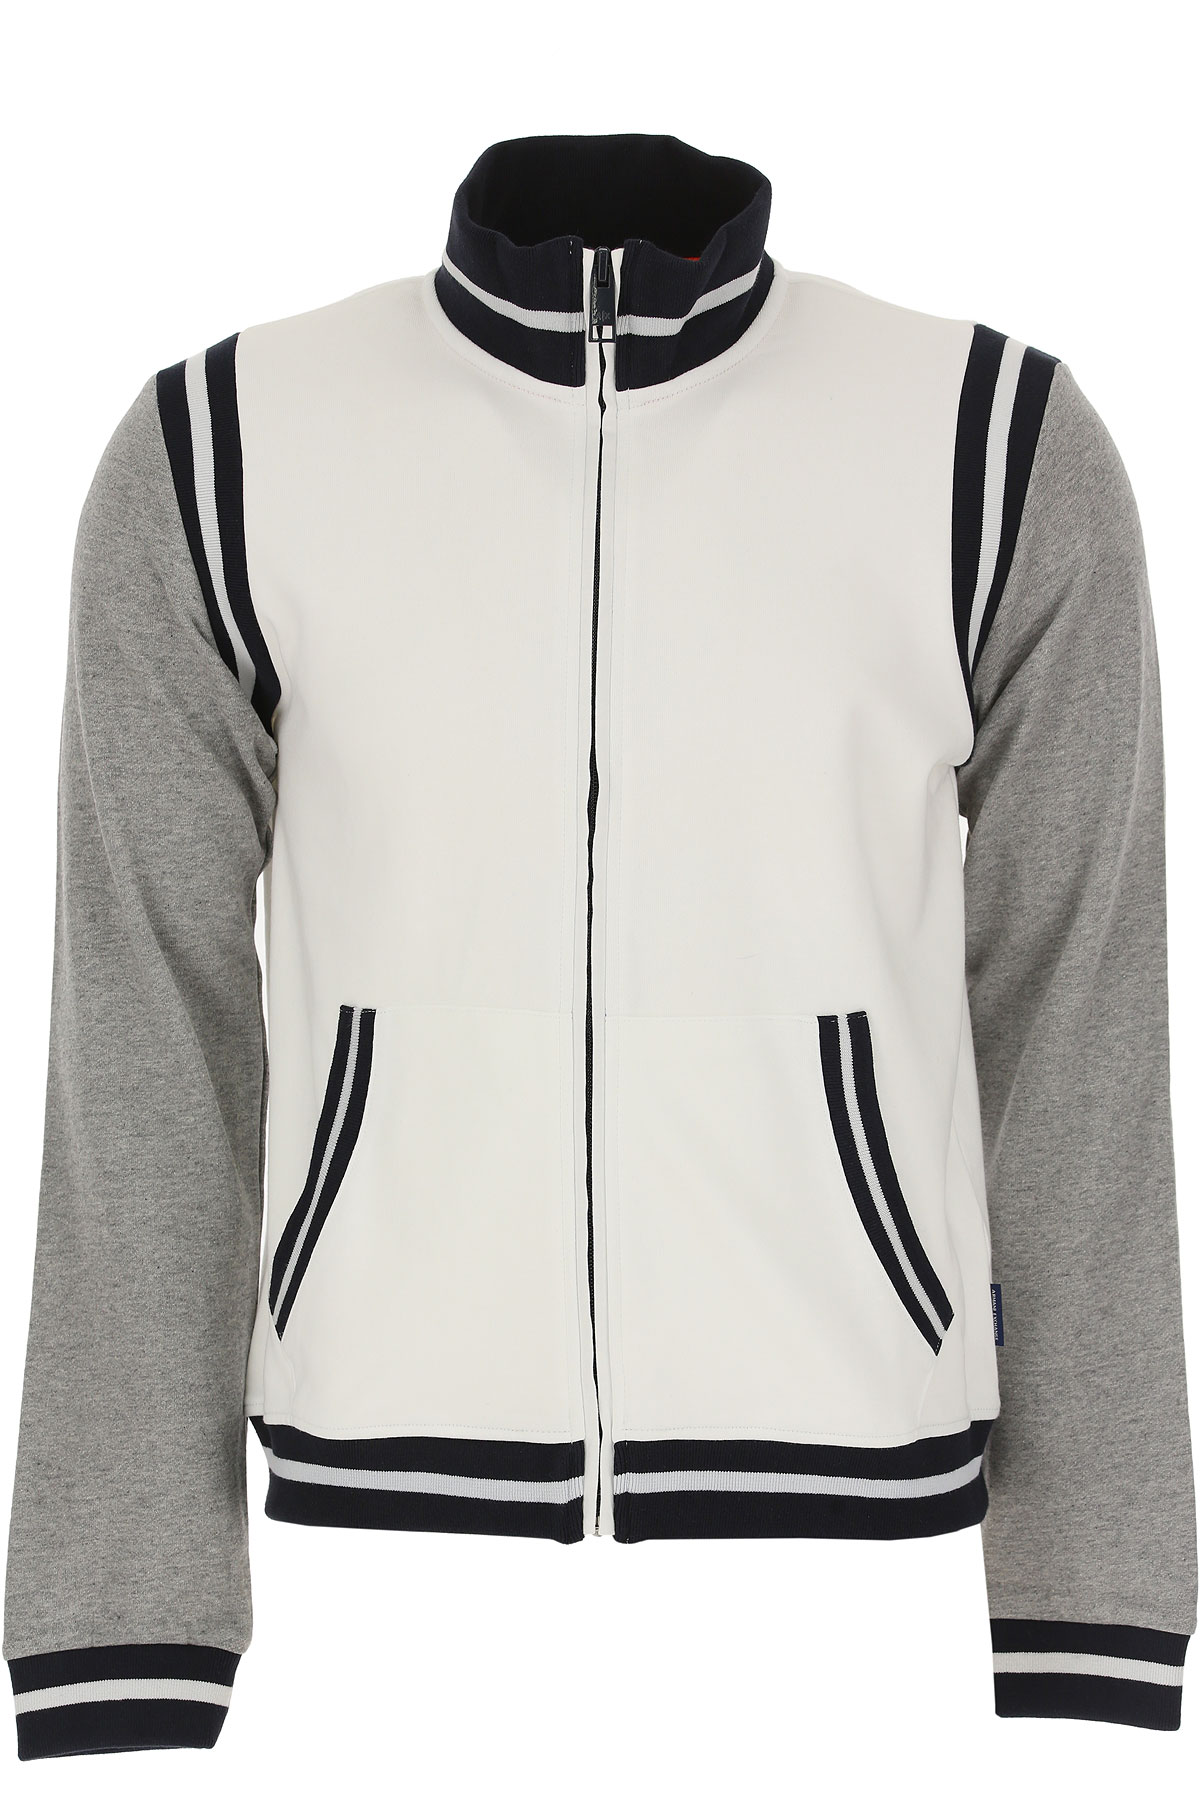 Emporio Armani Sweatshirt for Men On Sale, White, Cotton, 2017, L S XL USA-464118